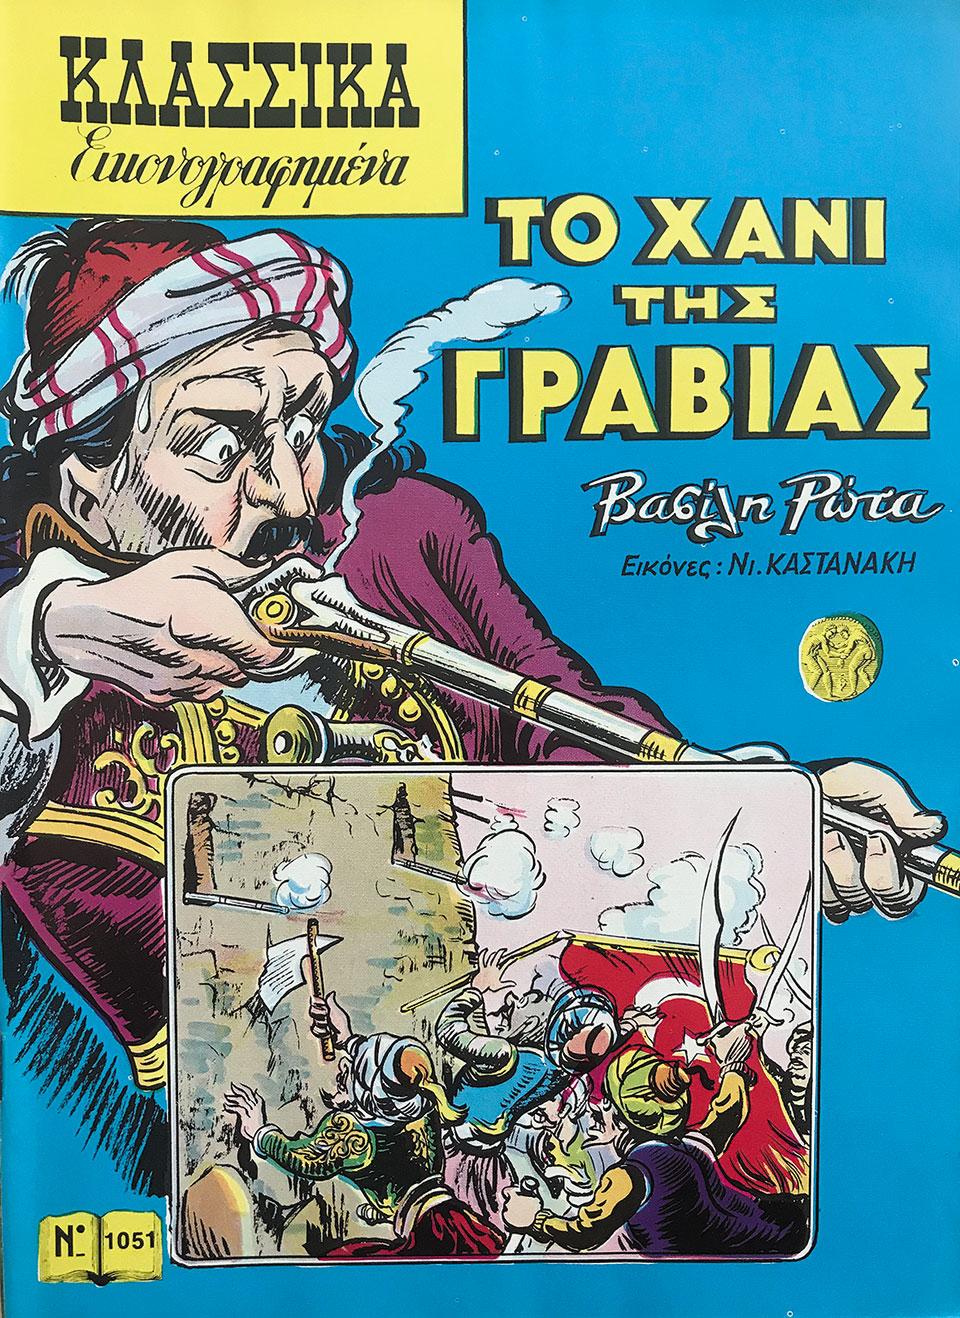 ta-ellinika-klassika-eikonografimena-egrapsan-istoria0